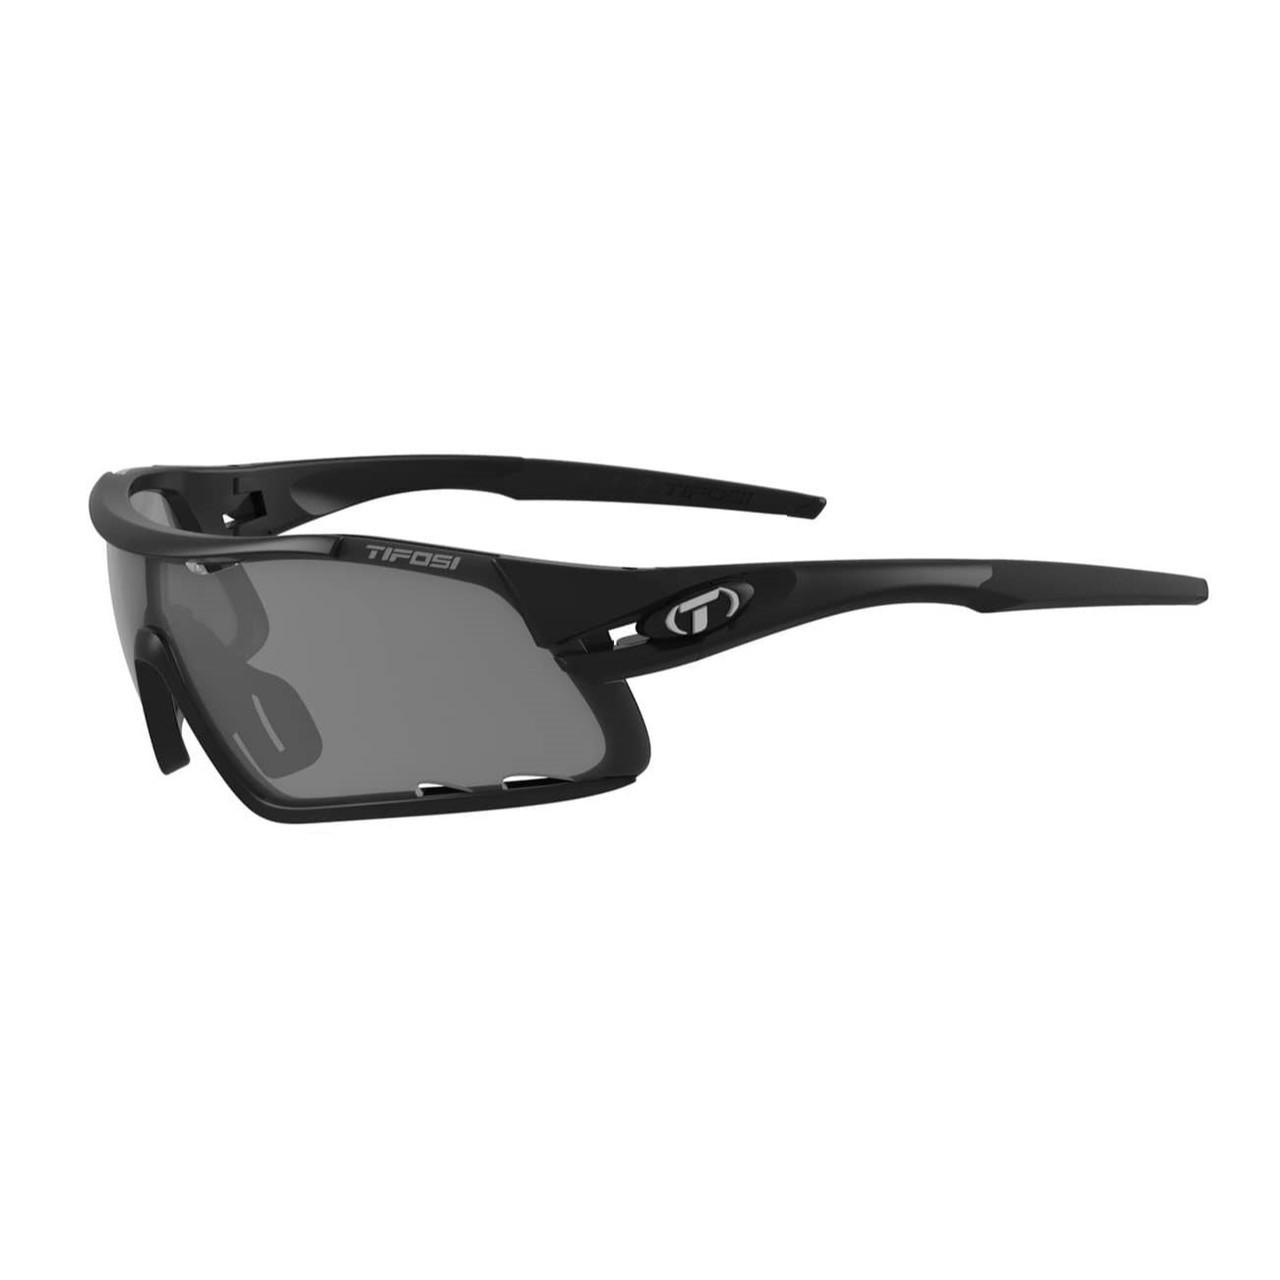 Tifosi Davos Interchangeable Sunglasses - 2019 price